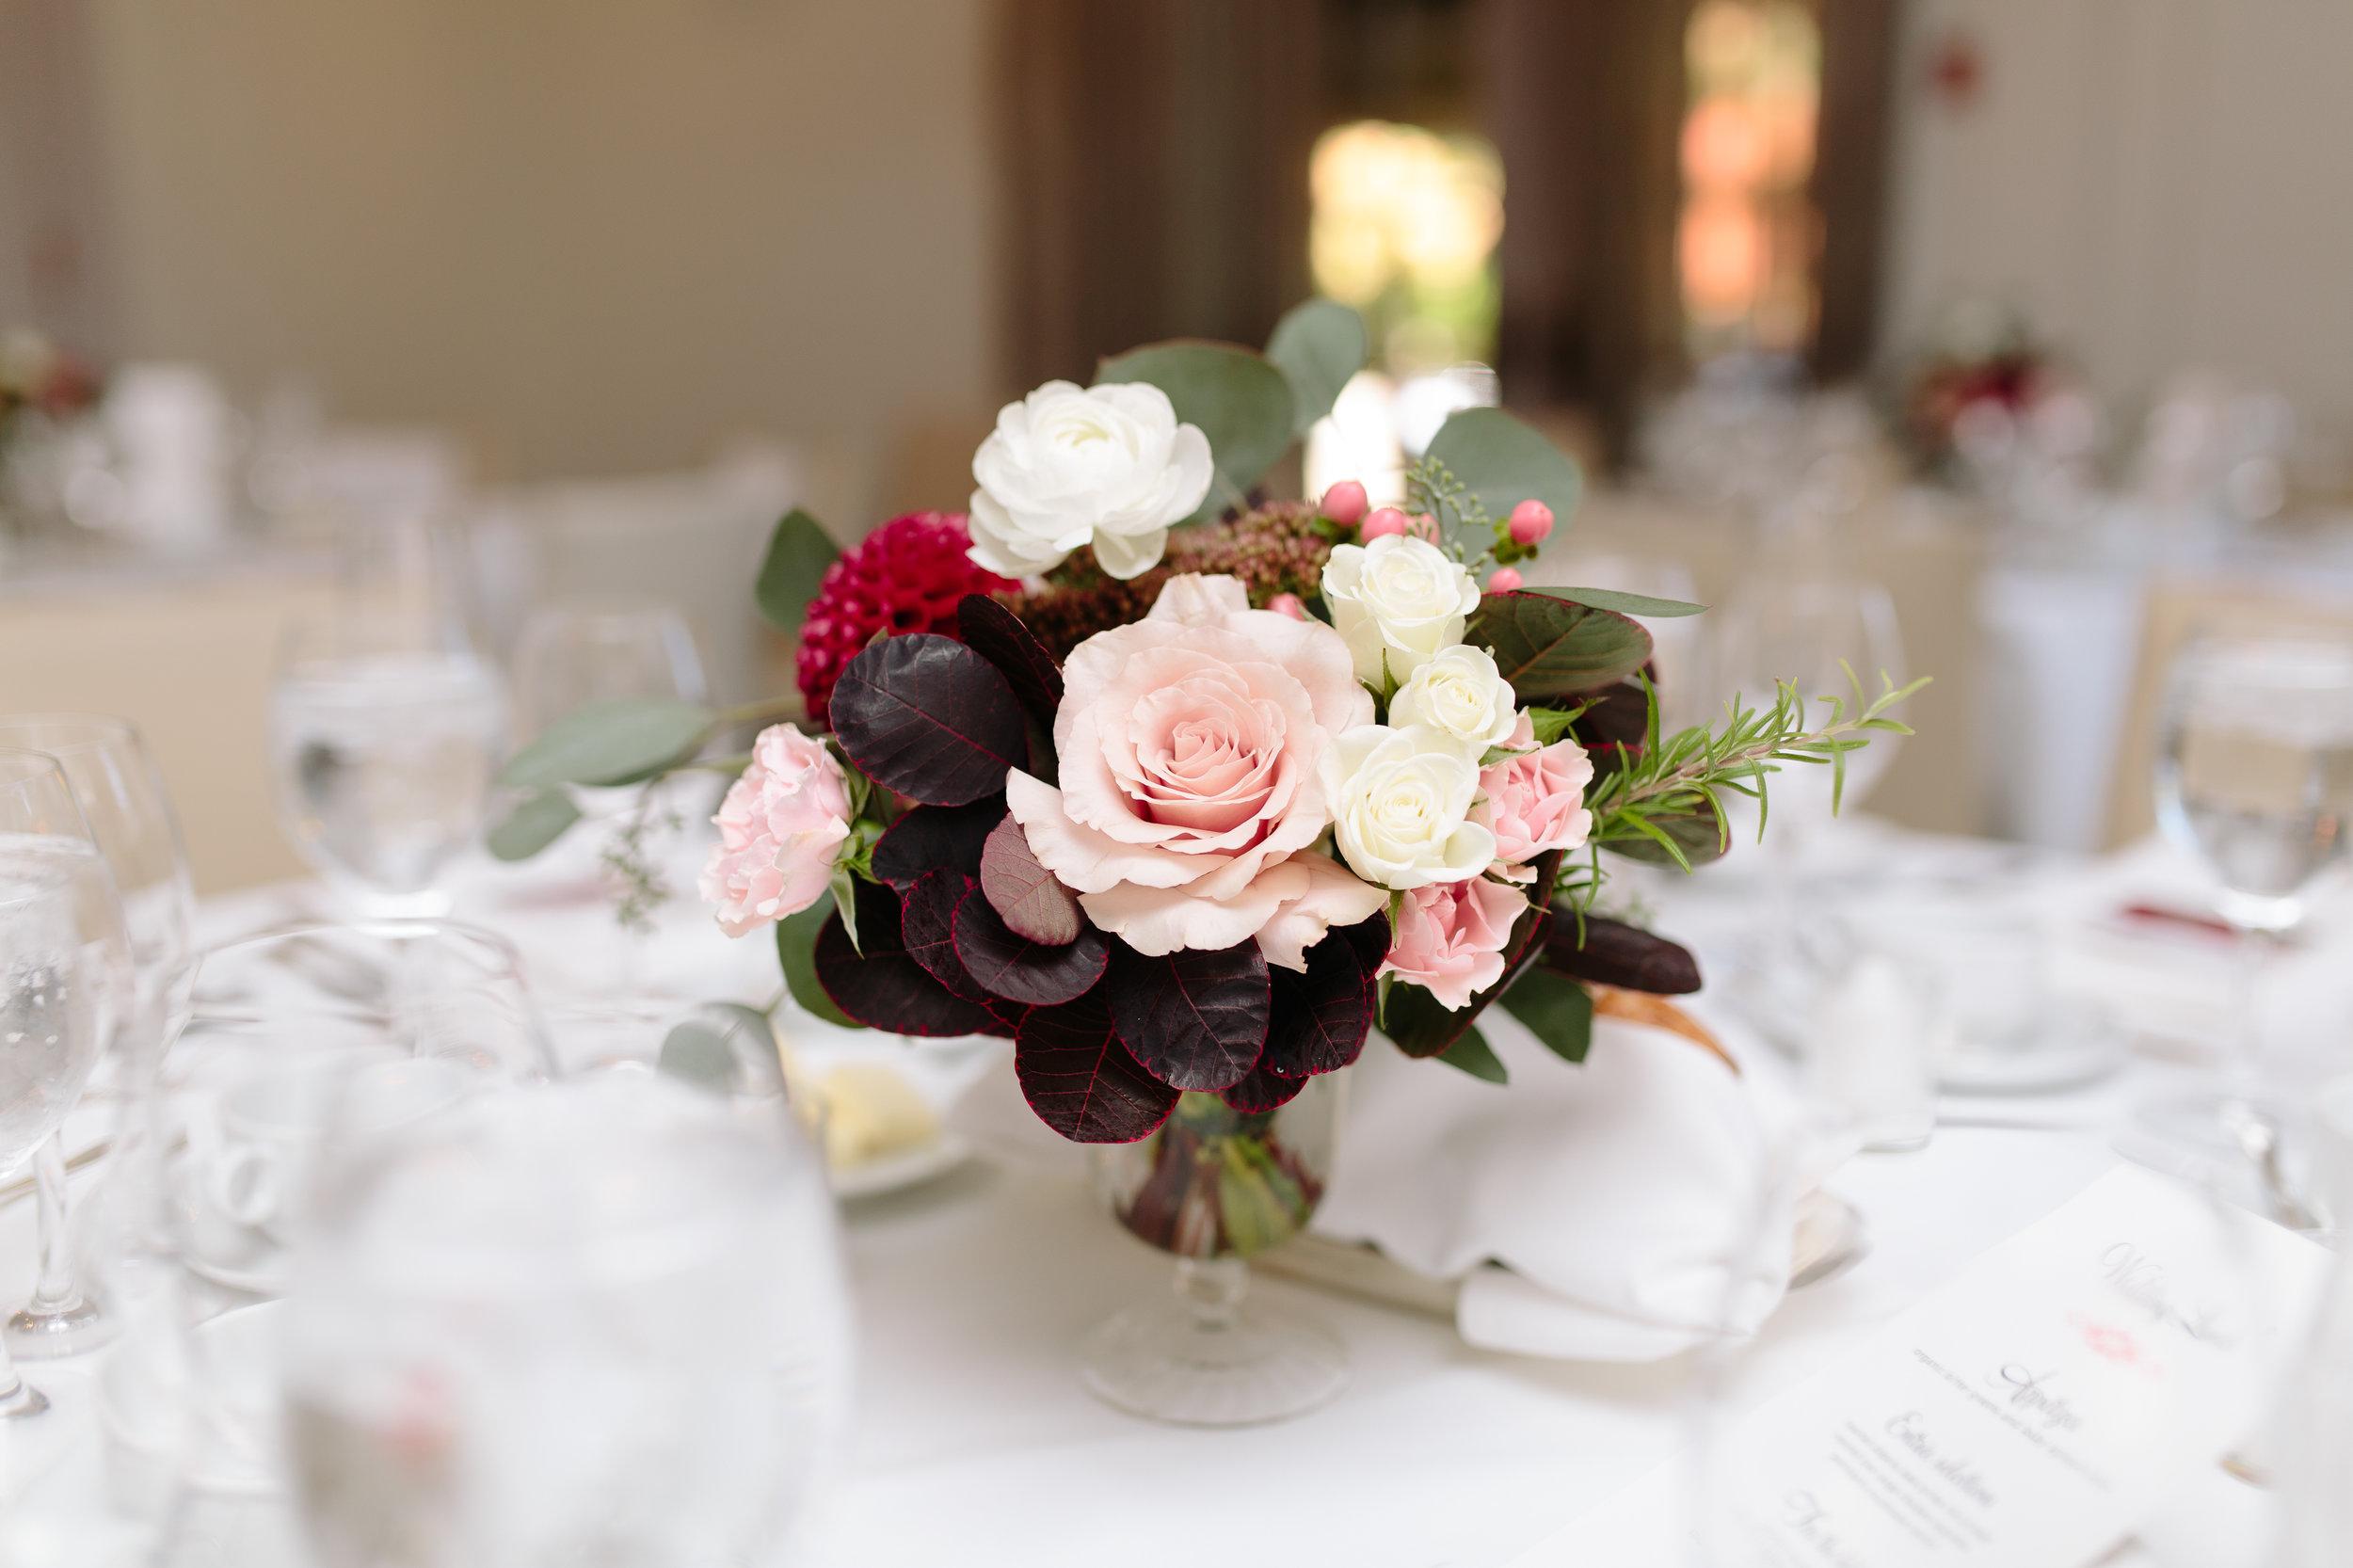 Phoebe Lo Events Toronto Wedding - Estates of Sunnybrook Rustic Event 021.jpg